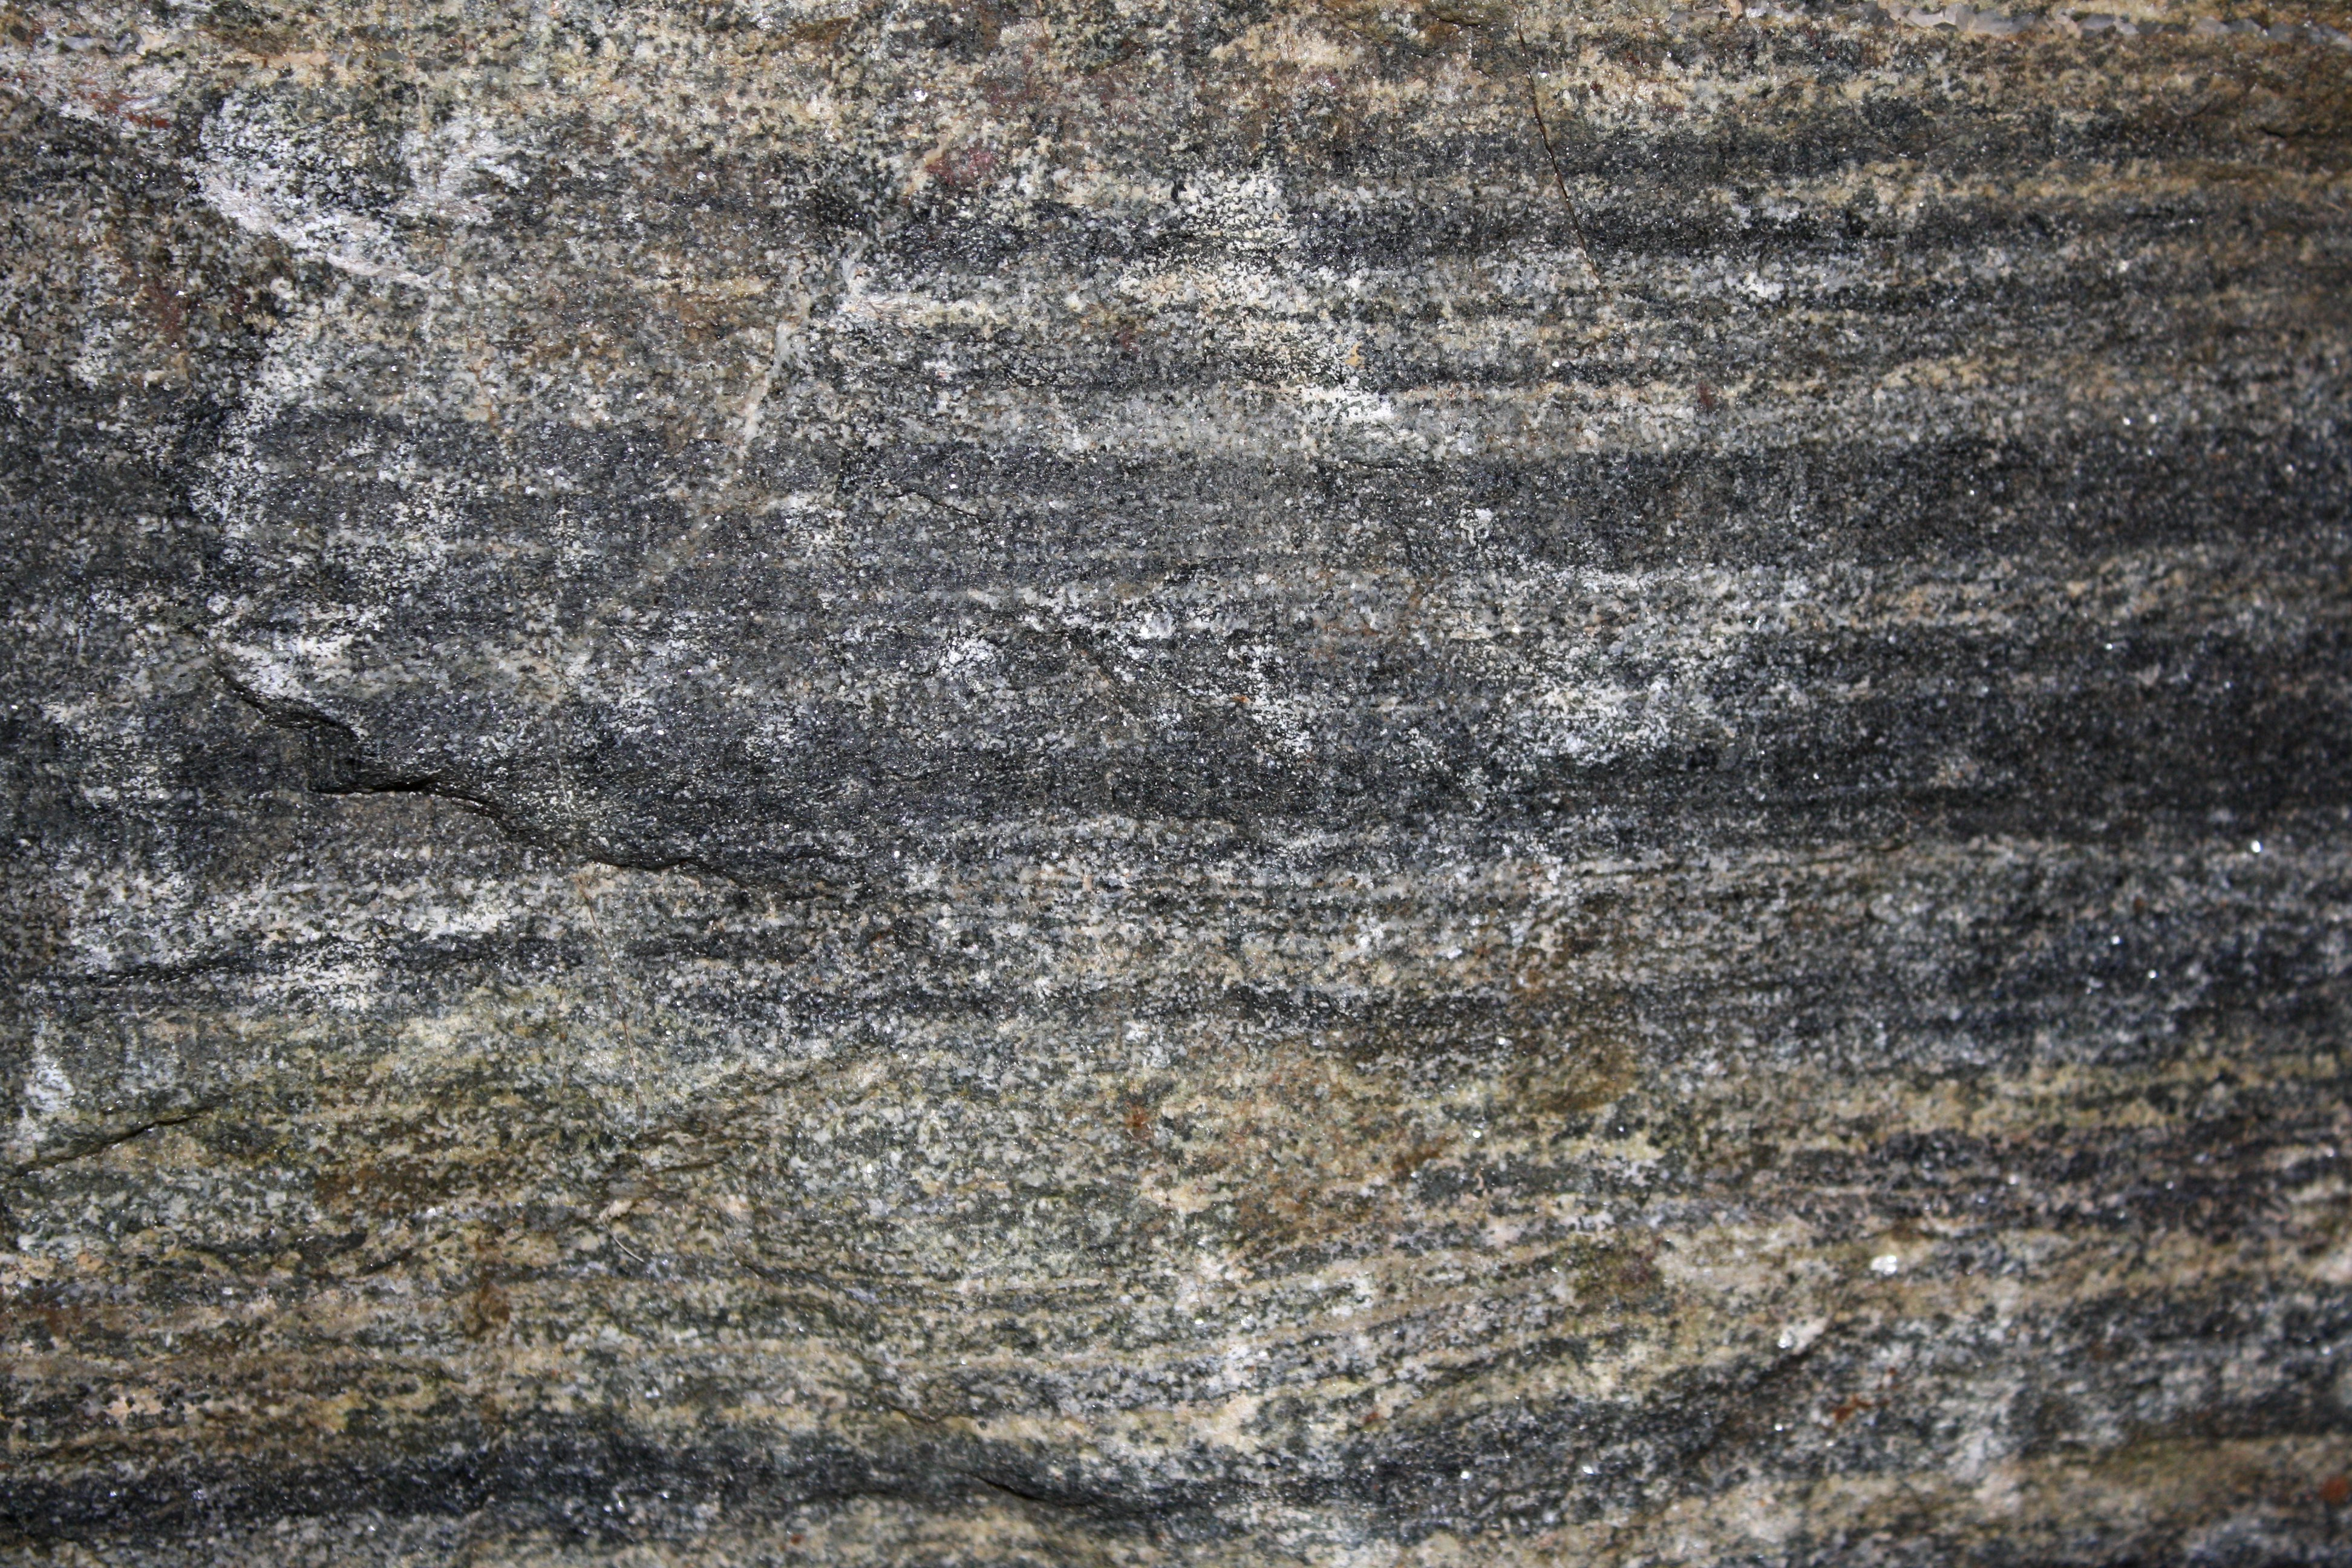 Banded Biotite Mica Schist Rock Texture